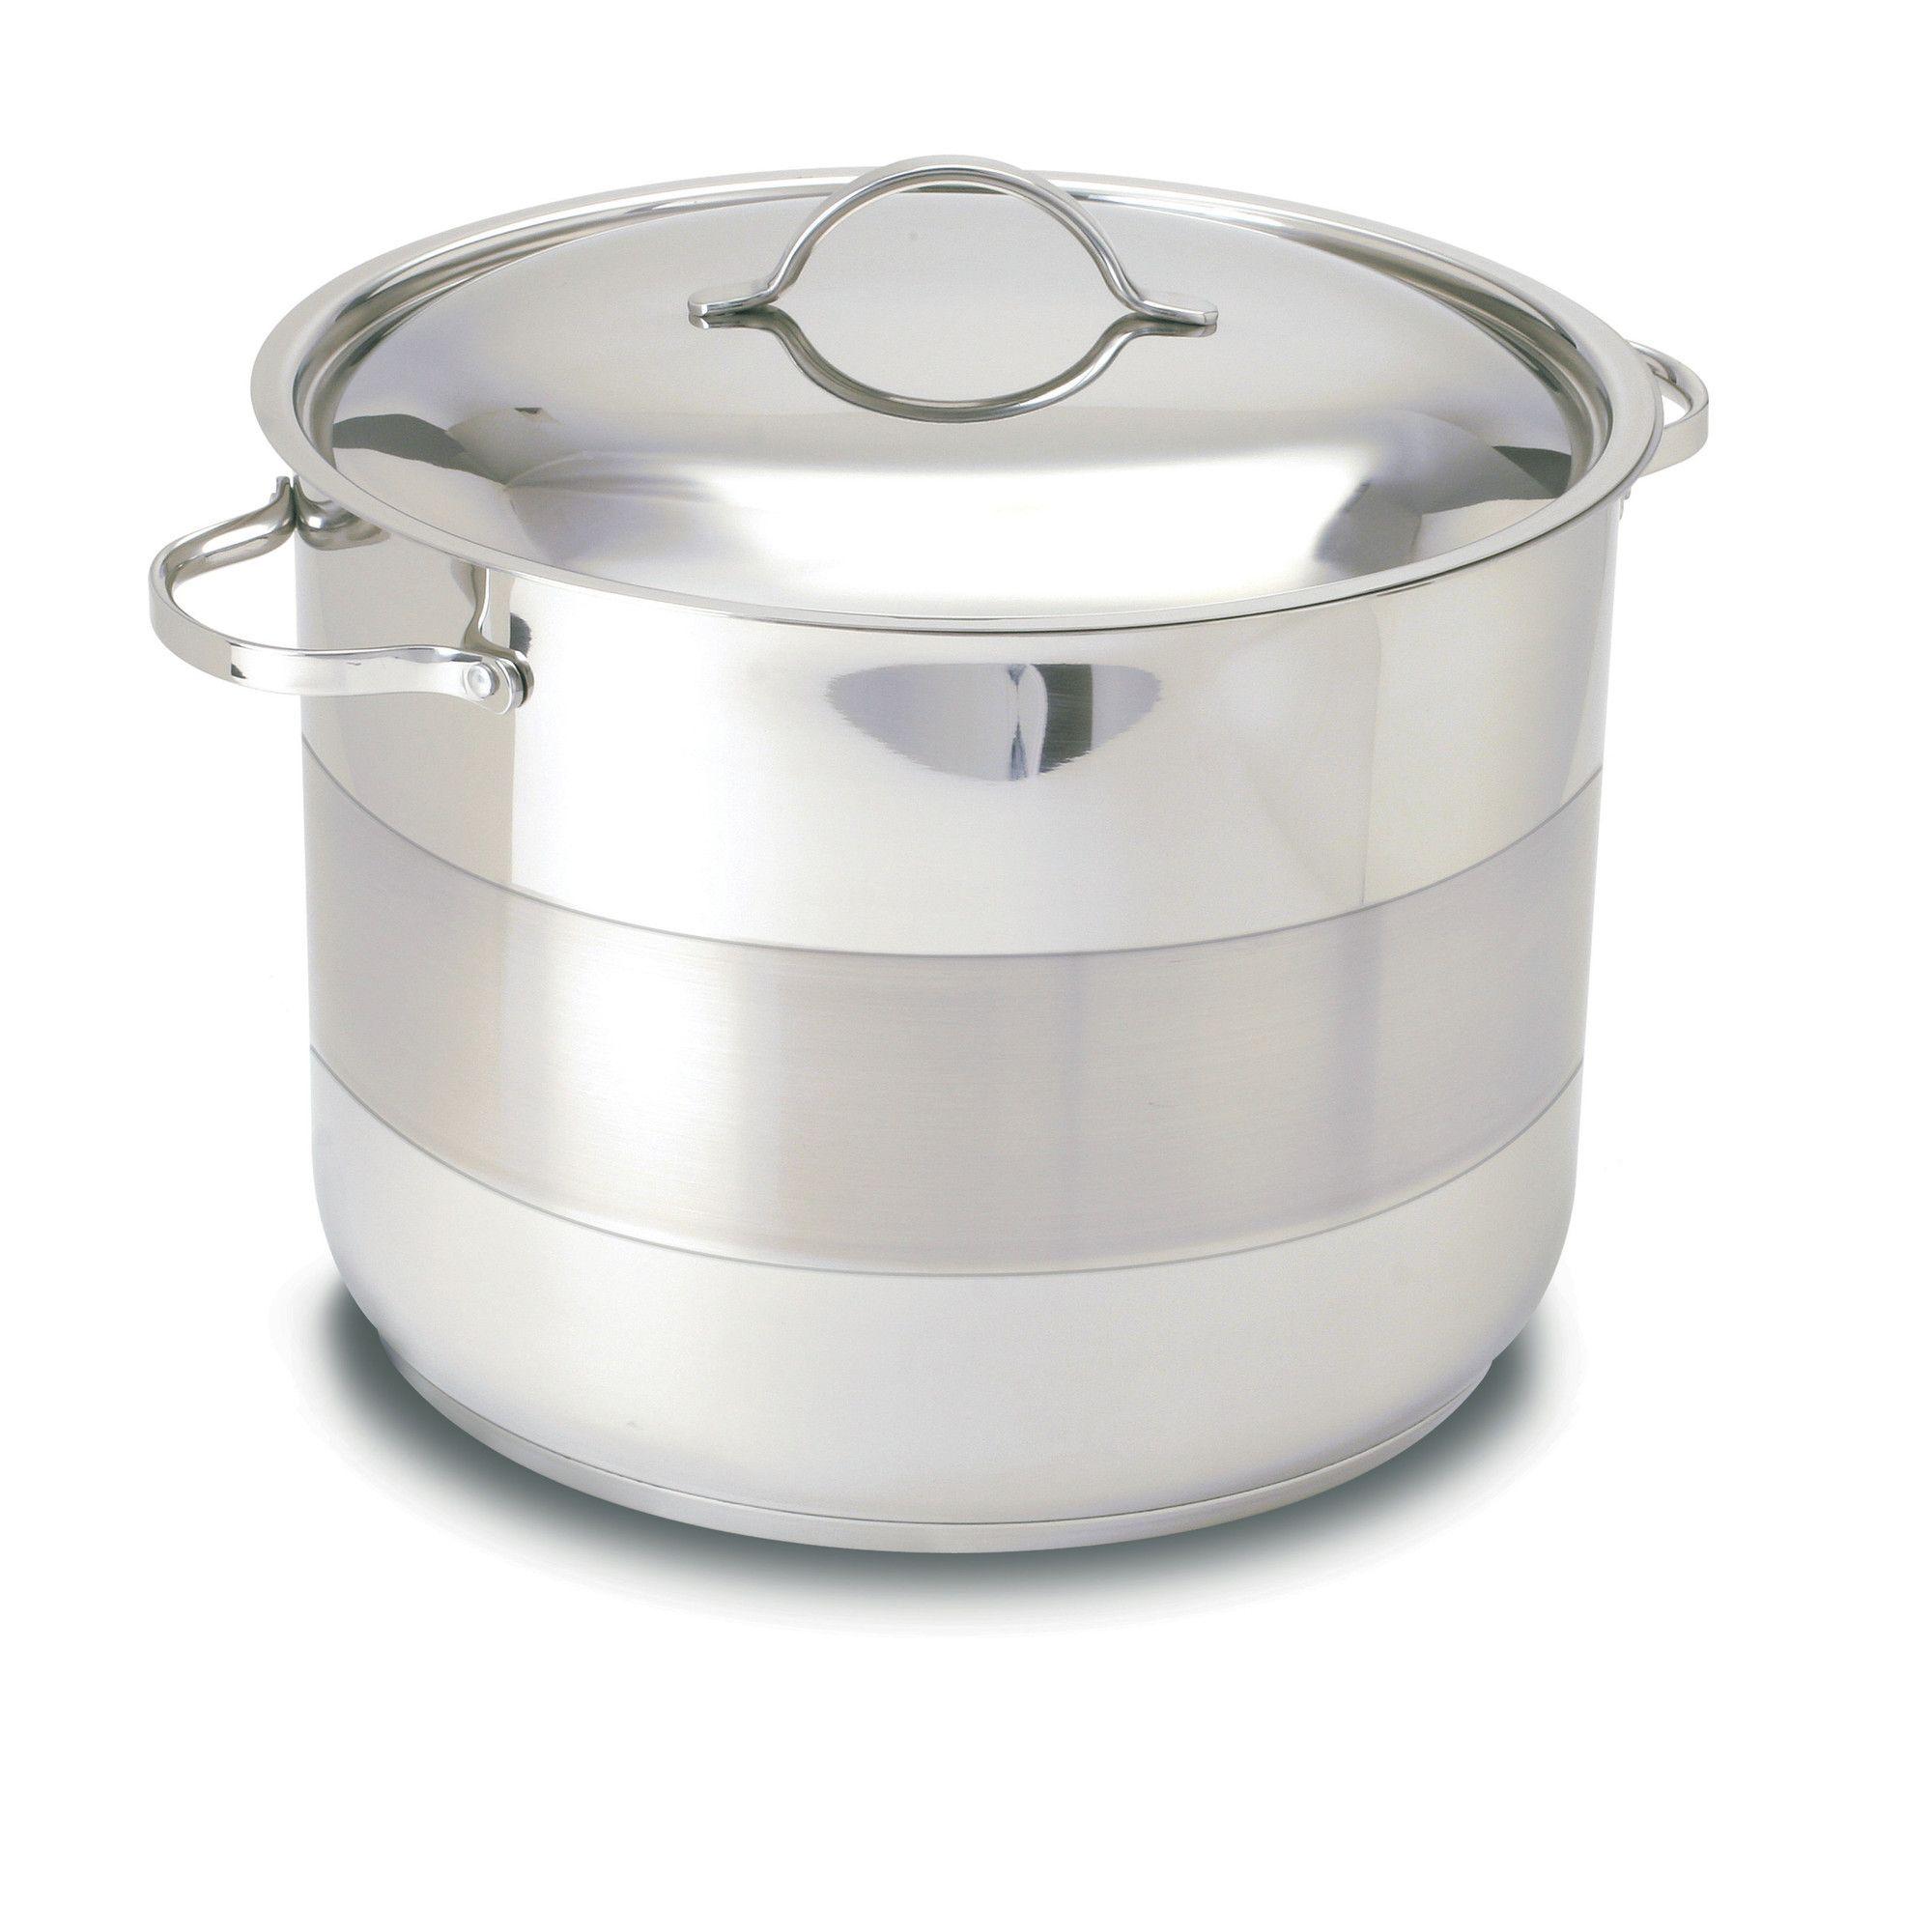 Cuisinox Gourmet Stock Pot With Lid Dutch Oven Set Specialty Cookware Dutch Oven